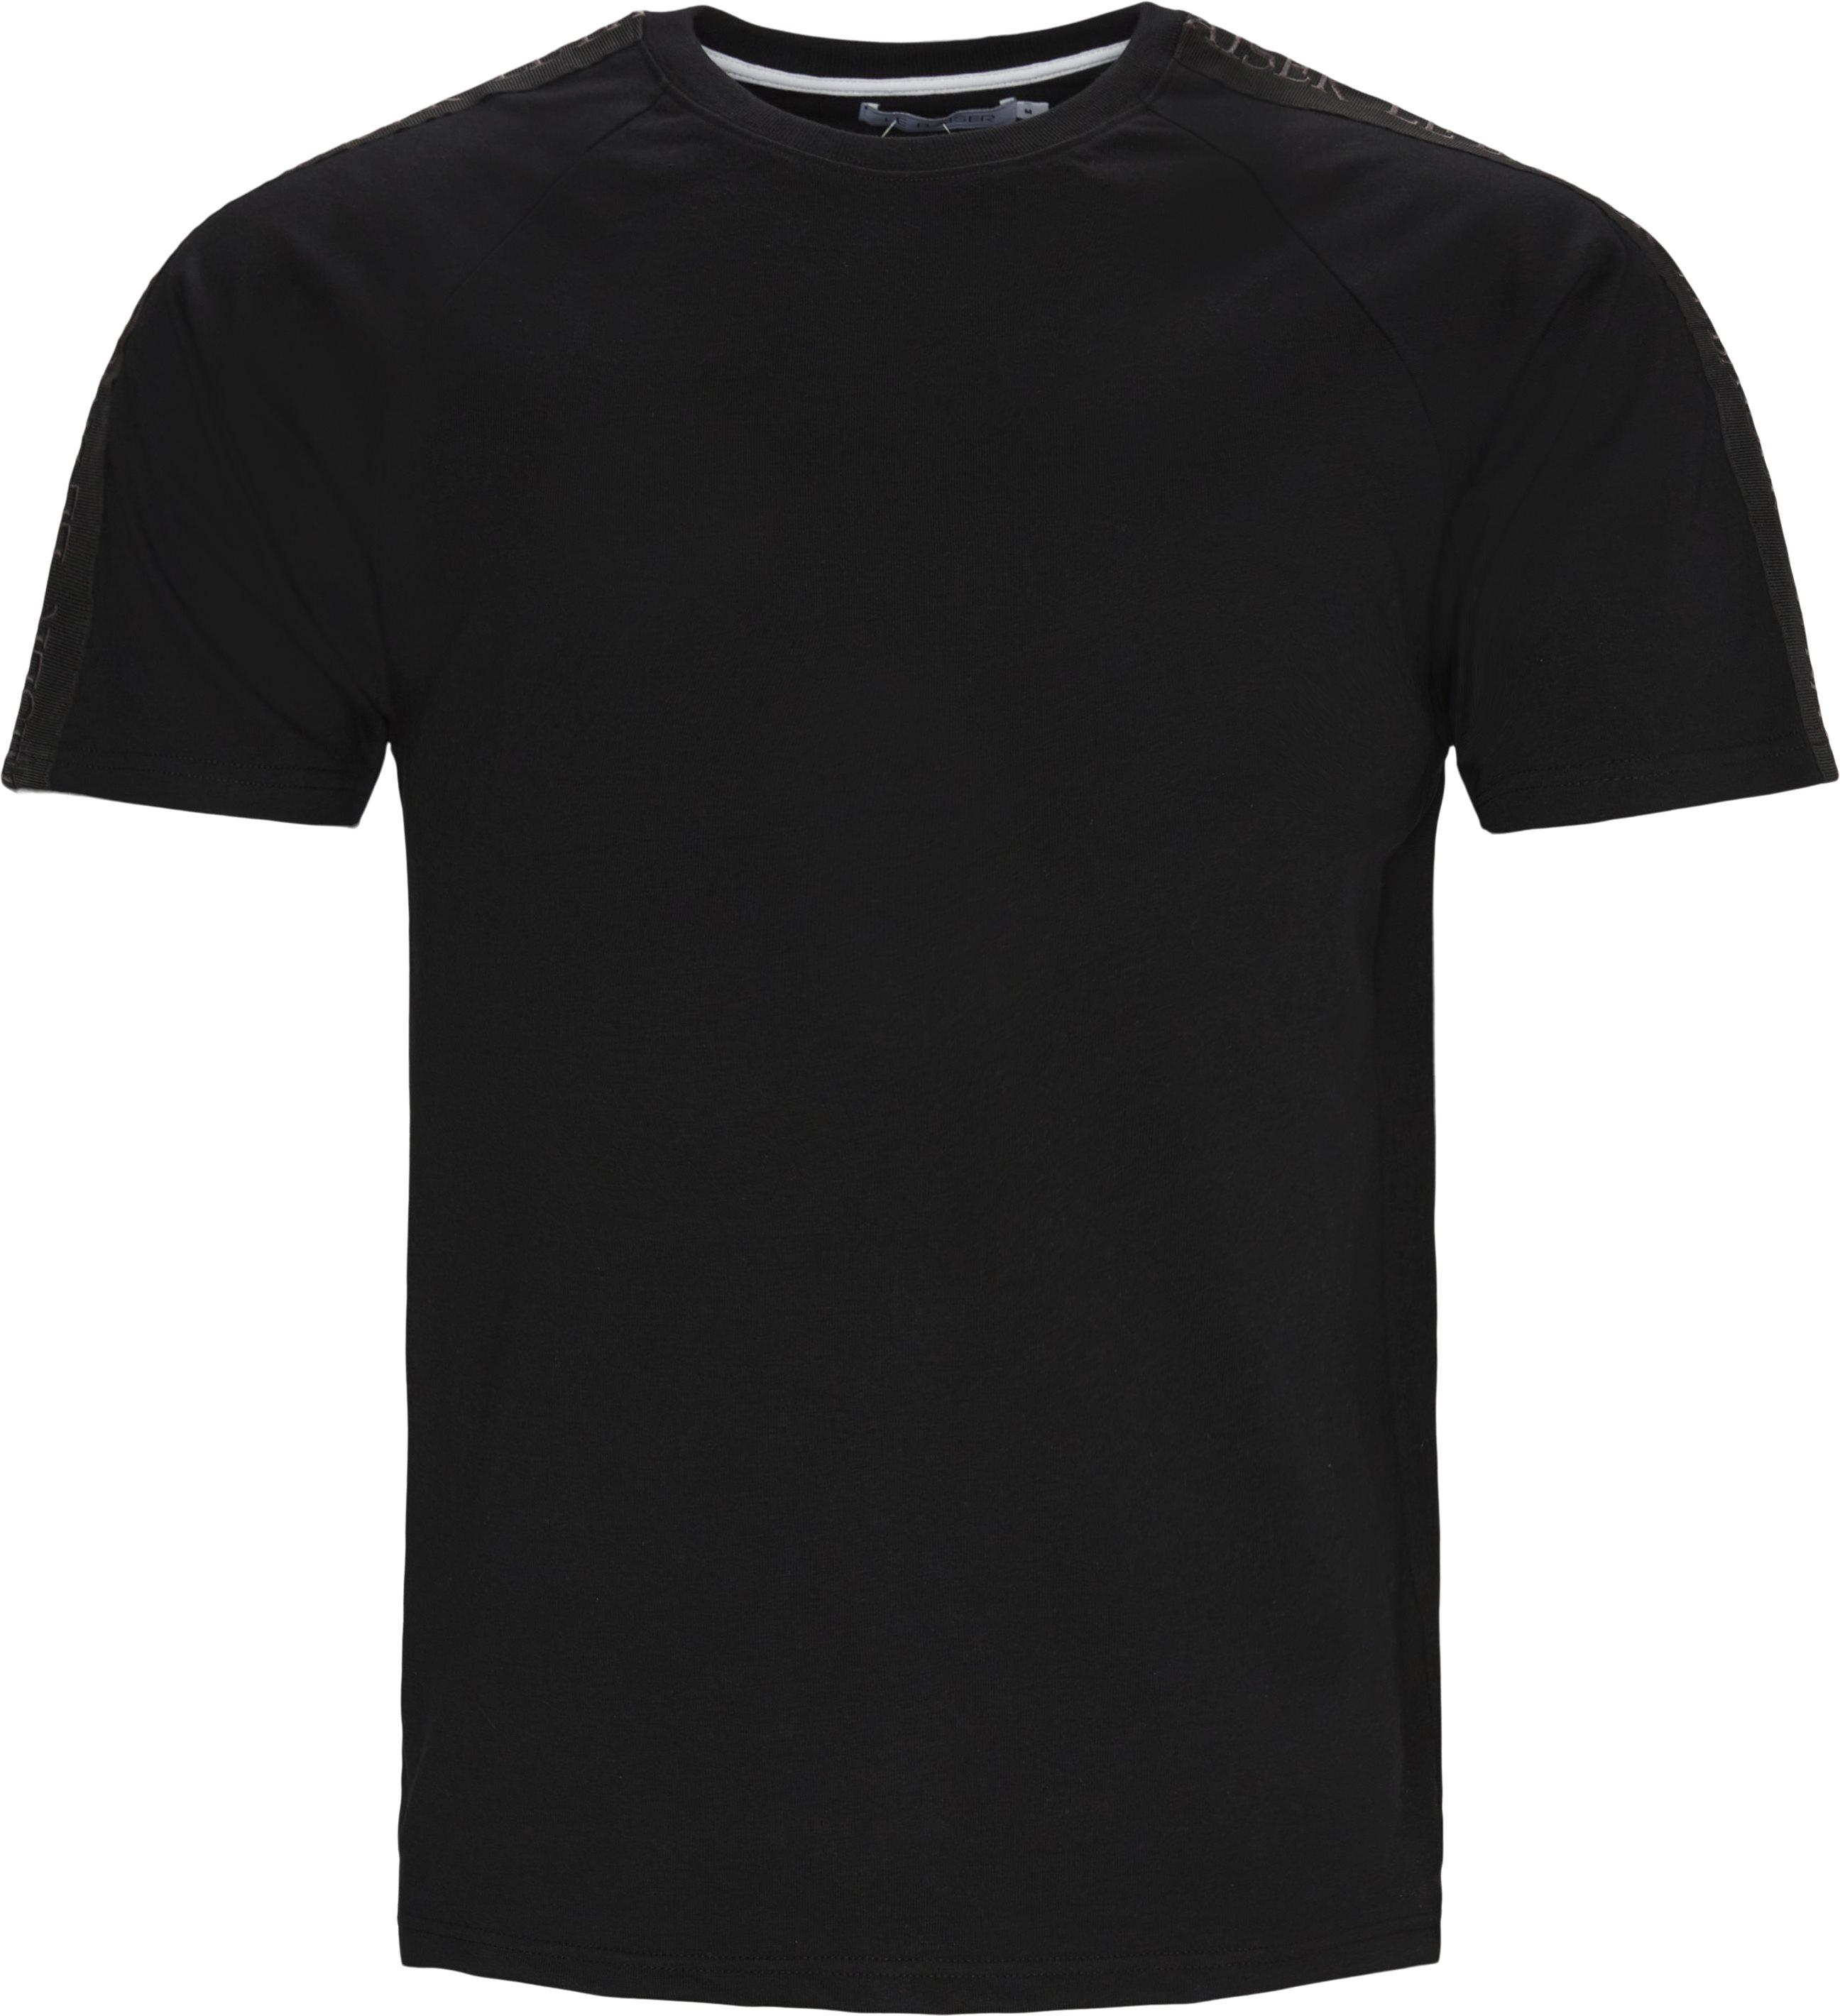 Menton Tee - T-shirts - Regular - Sort